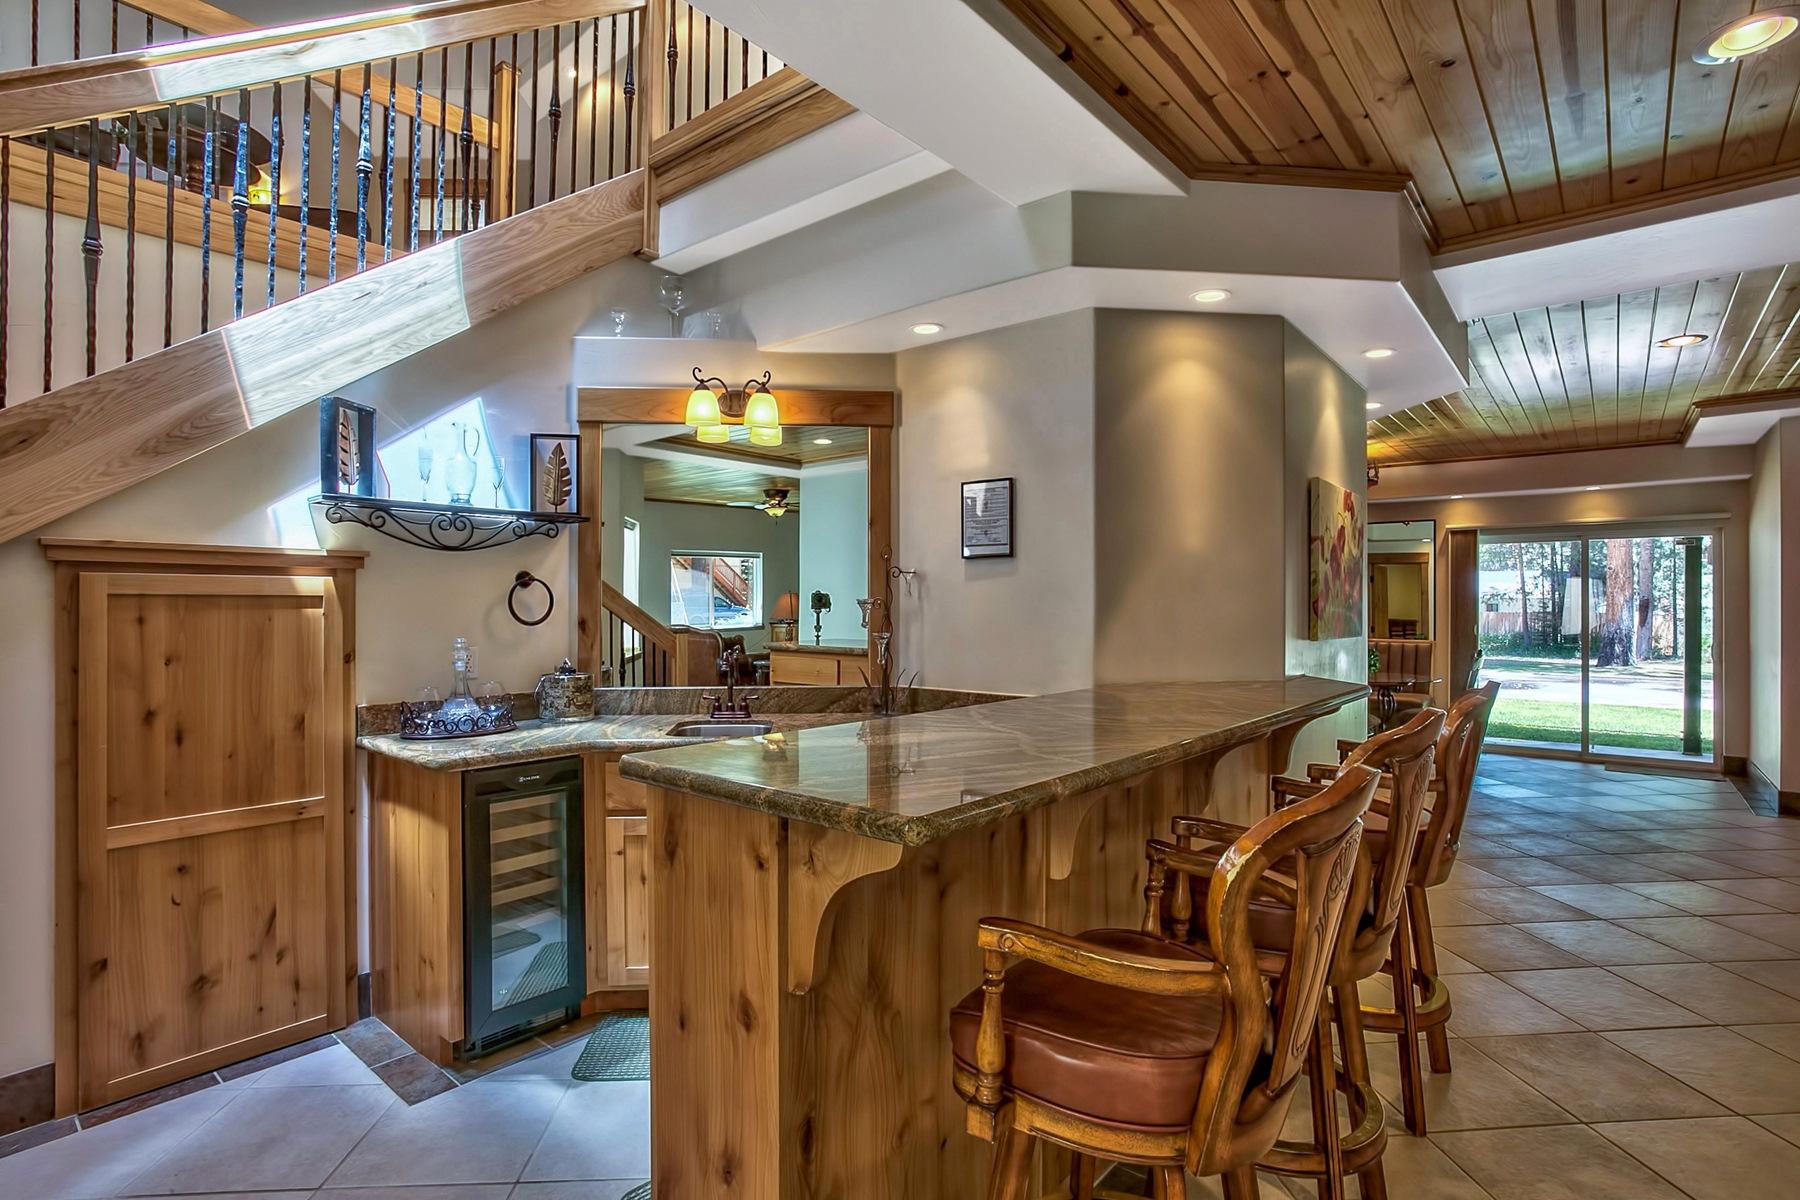 Additional photo for property listing at 745 Eloise Avenue  南太浩湖, 加利福尼亚州 96150 美国